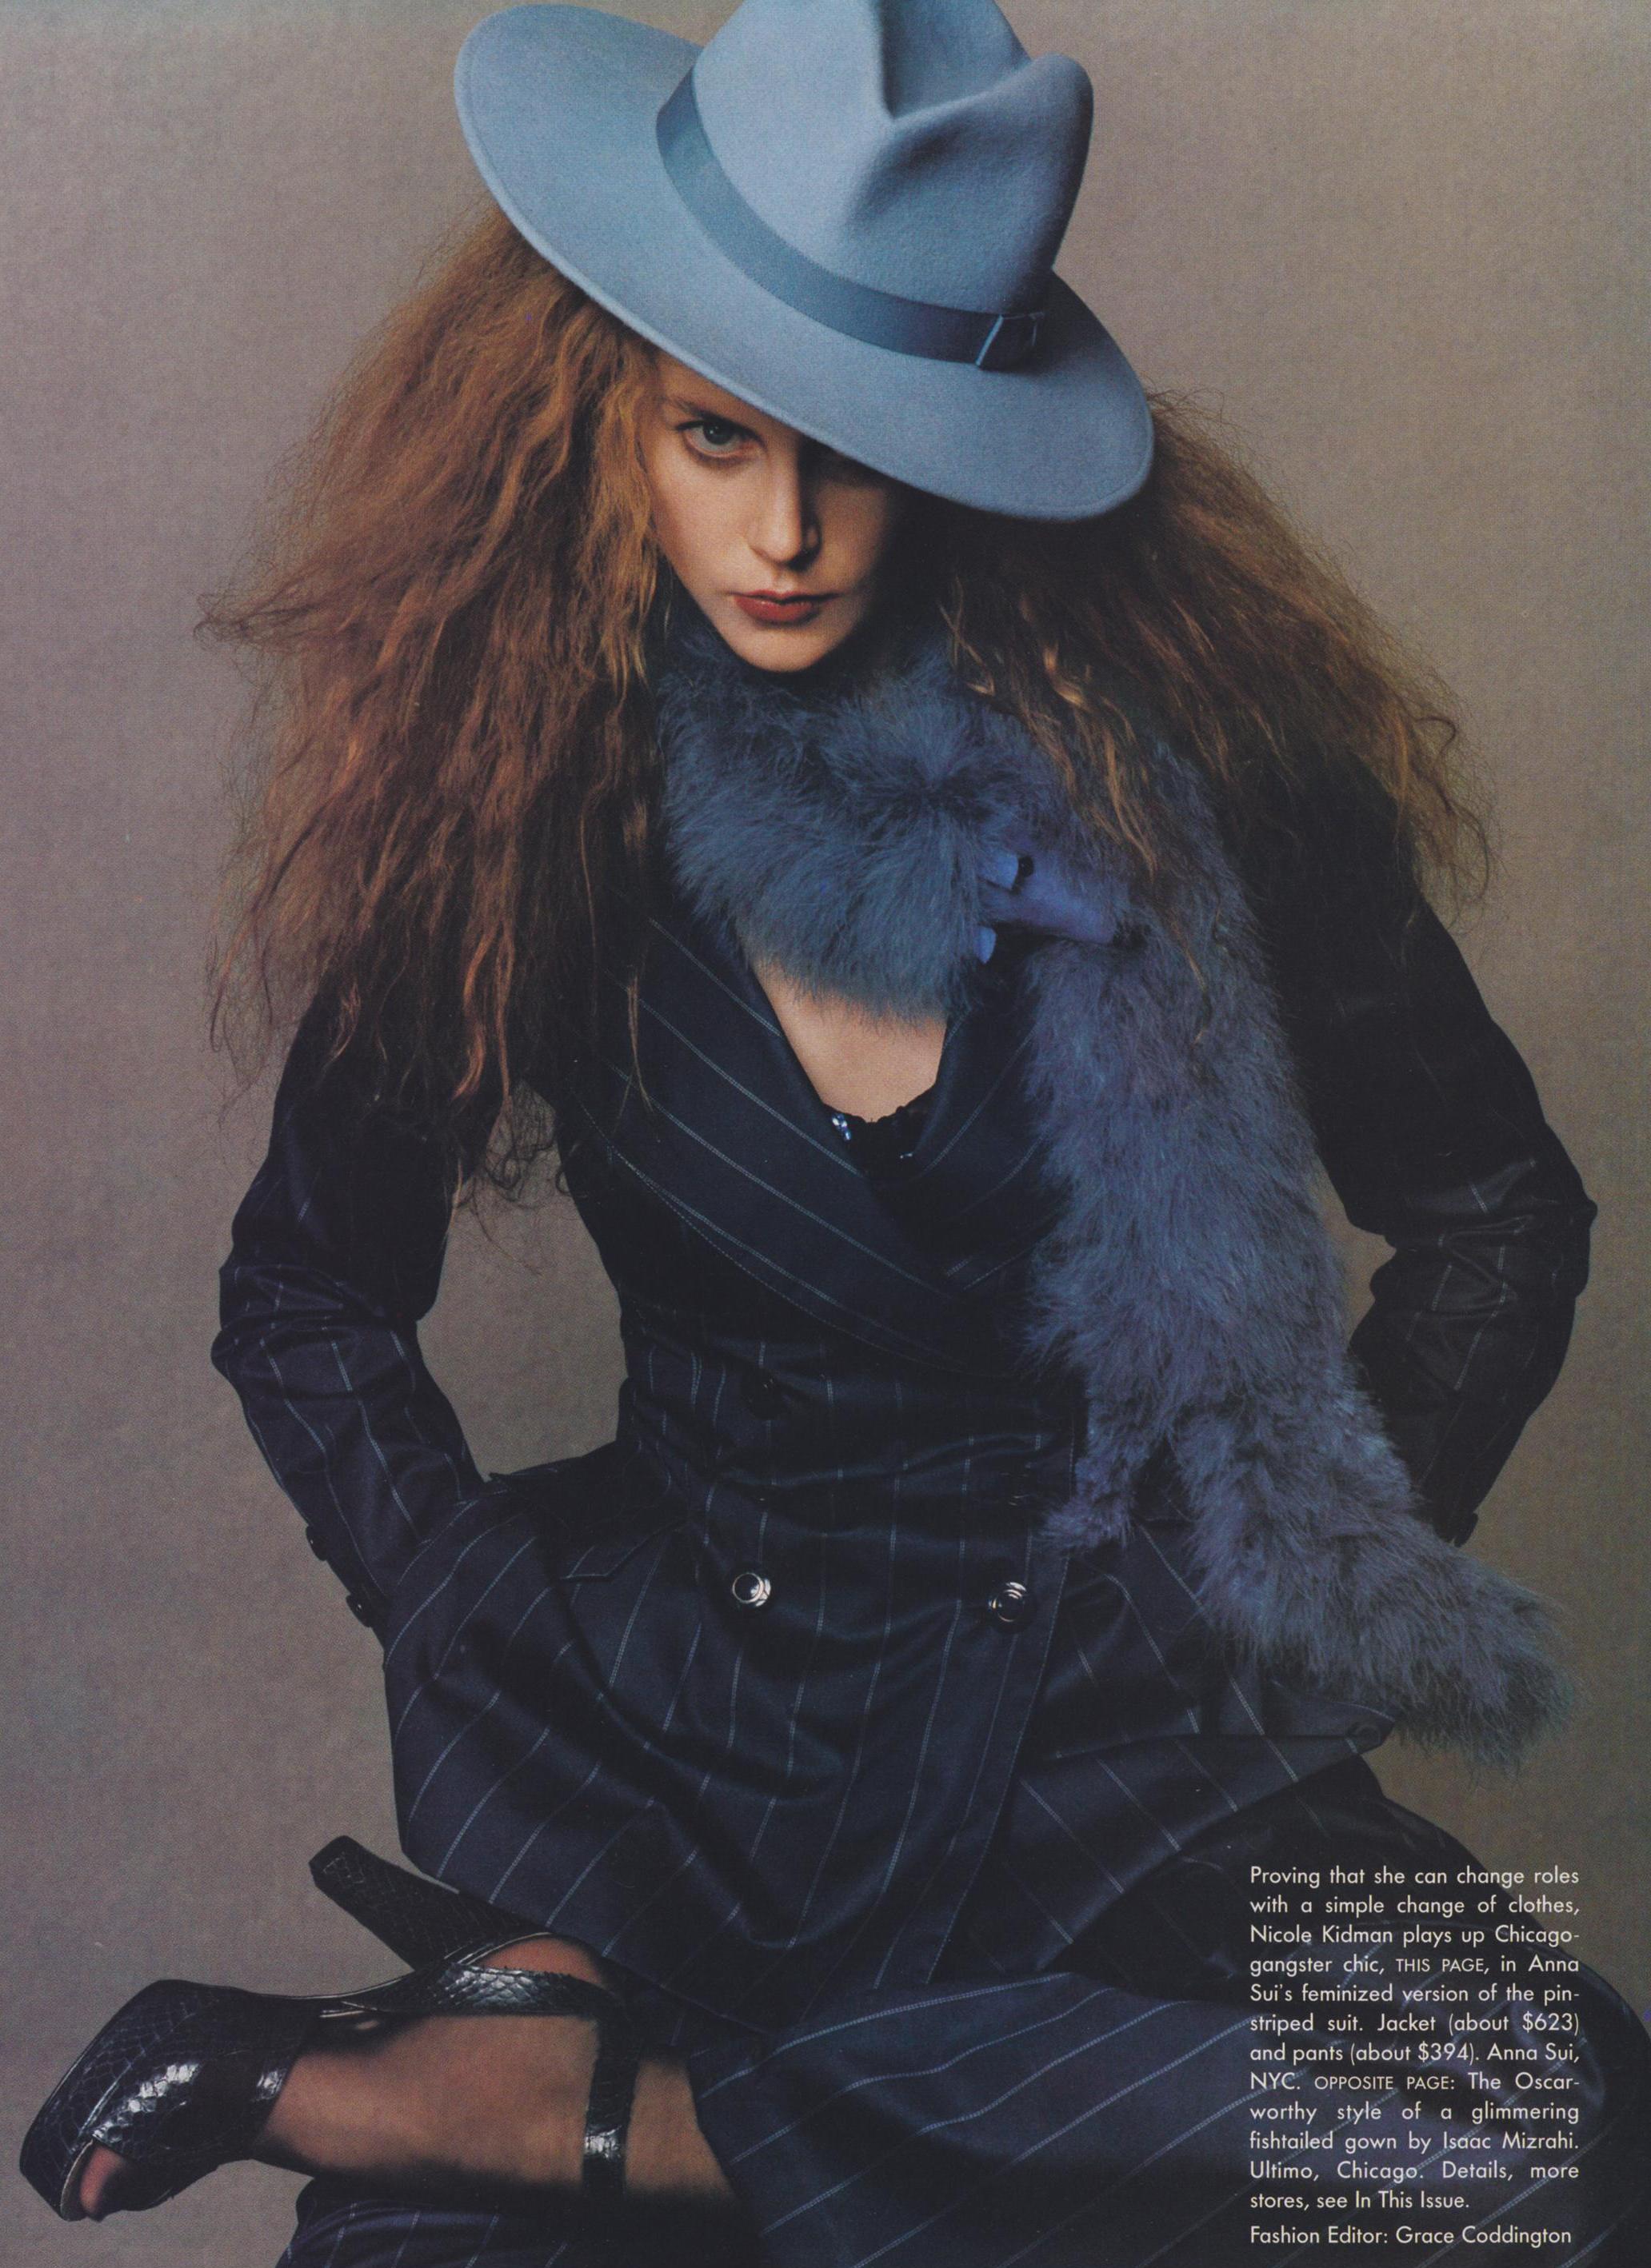 Nicole Kidman in a Sui pinstripe suit. Shot by Steven Meisel for Vogue, February 1995.